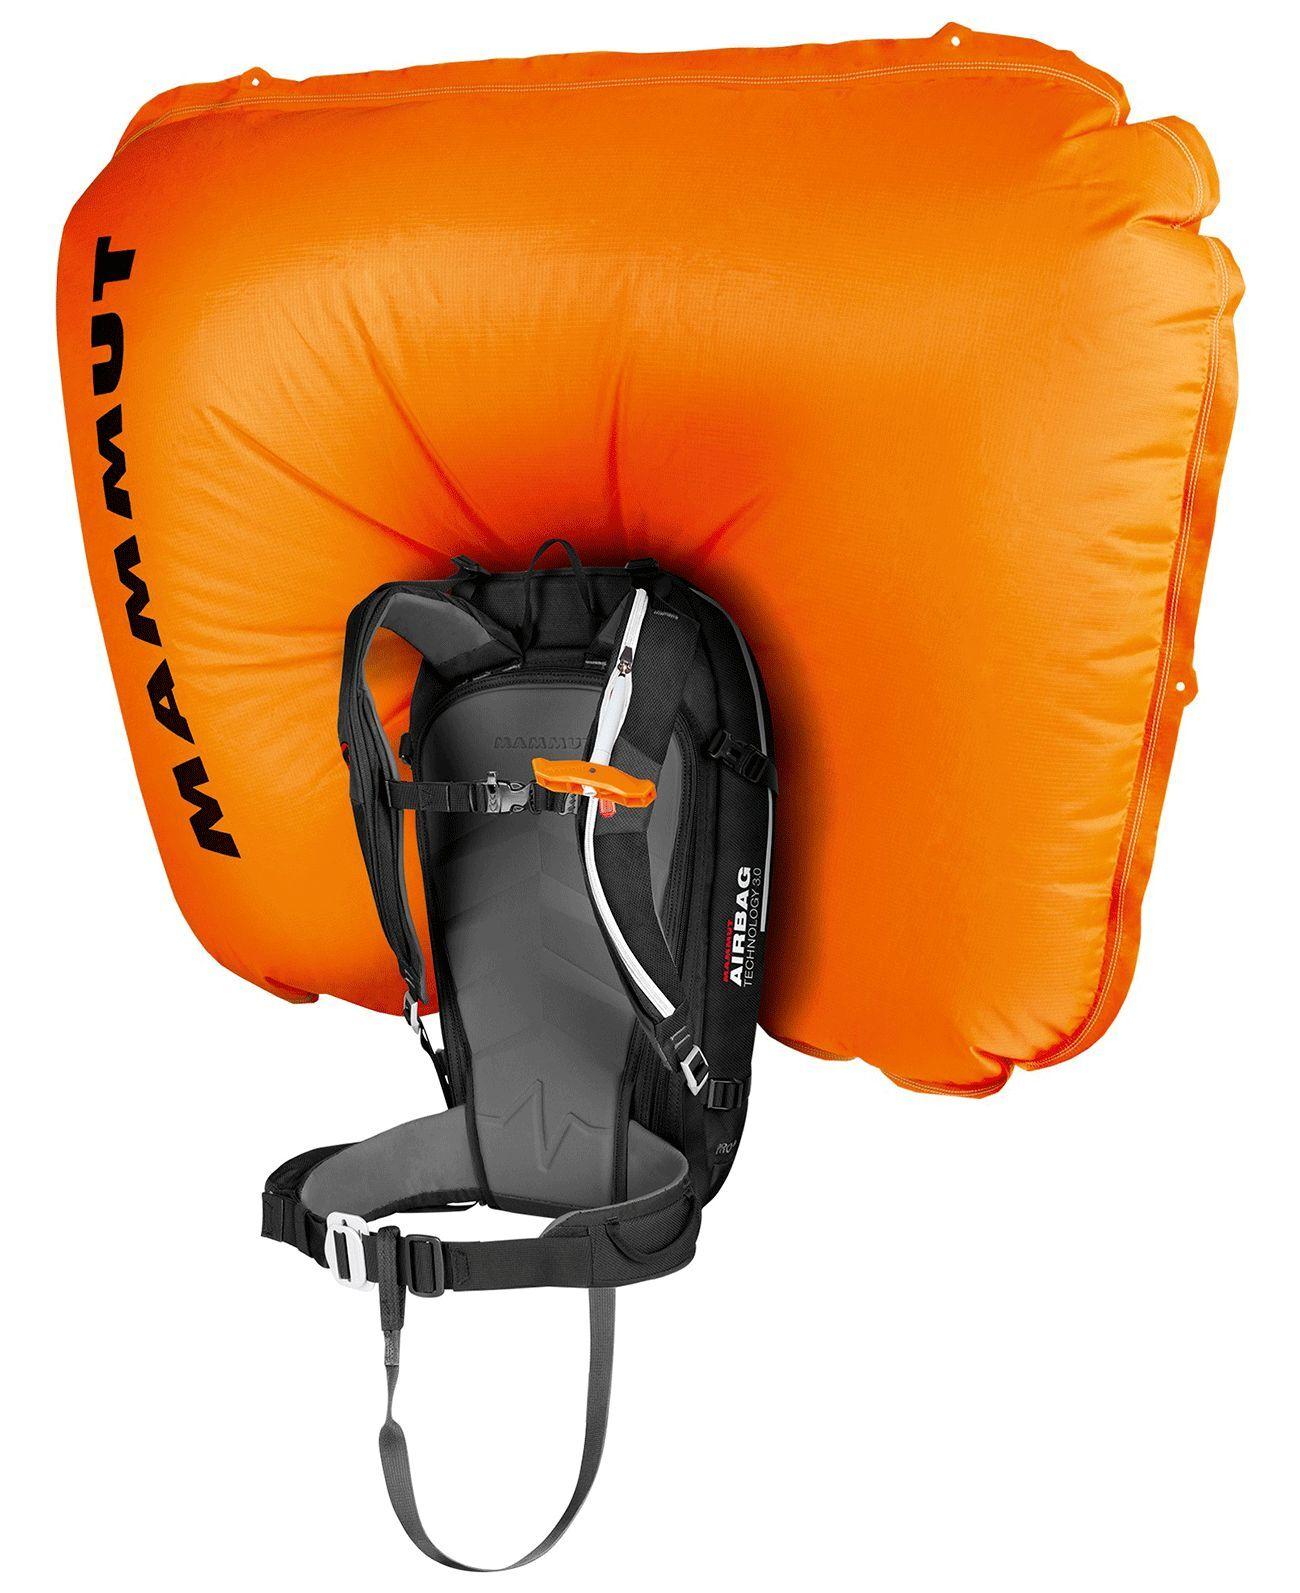 Mammut Pro Removable Airbag 3.0 45L - Ryggsäckar - Svart